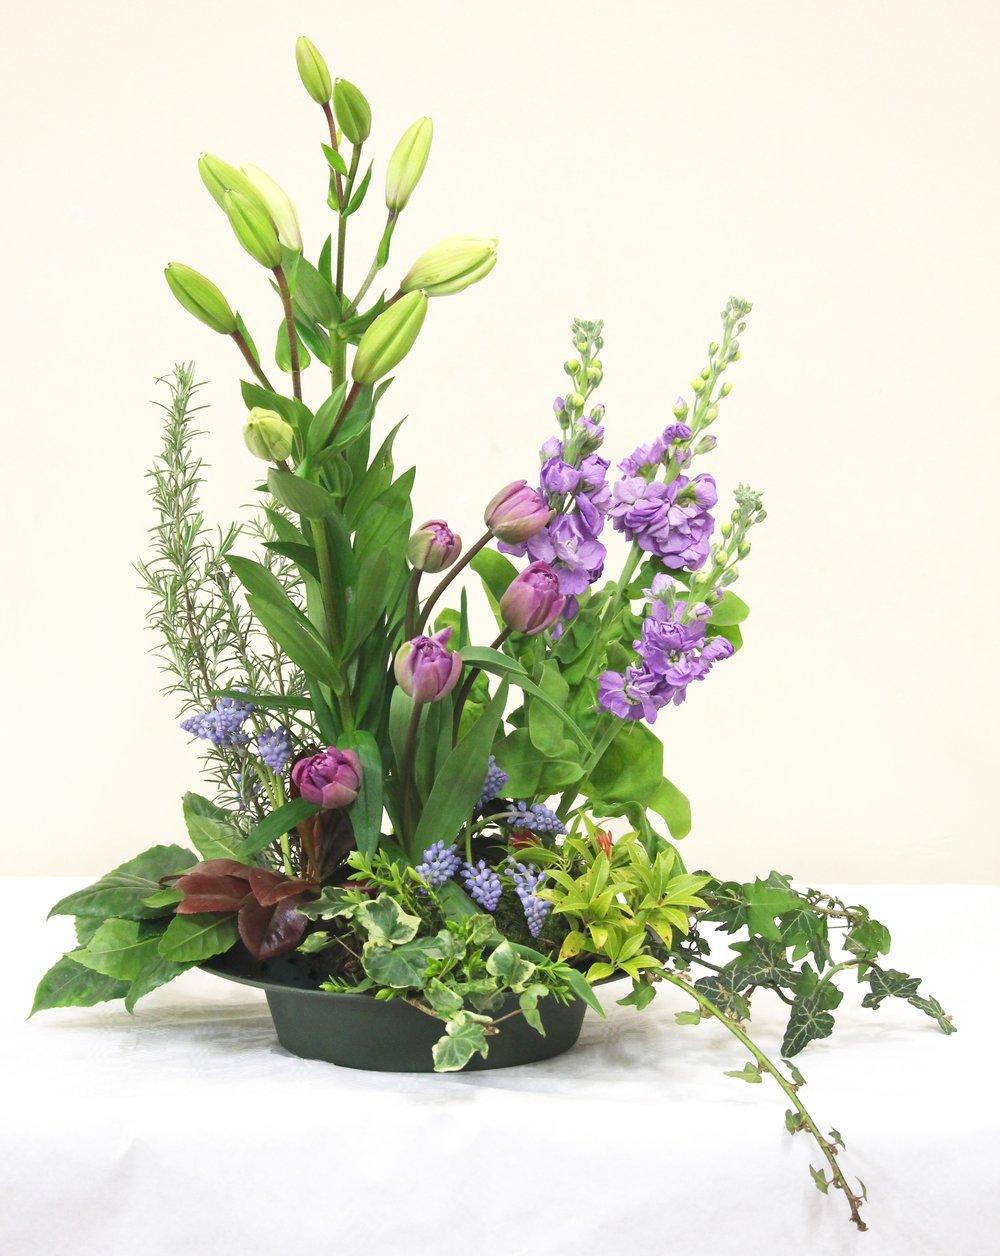 Lillian 'La prosecco'. Tulips 'Parrot prince', Muscari armeniacum, Matthiola figaro 'Lavendel',and Rosmarinus.